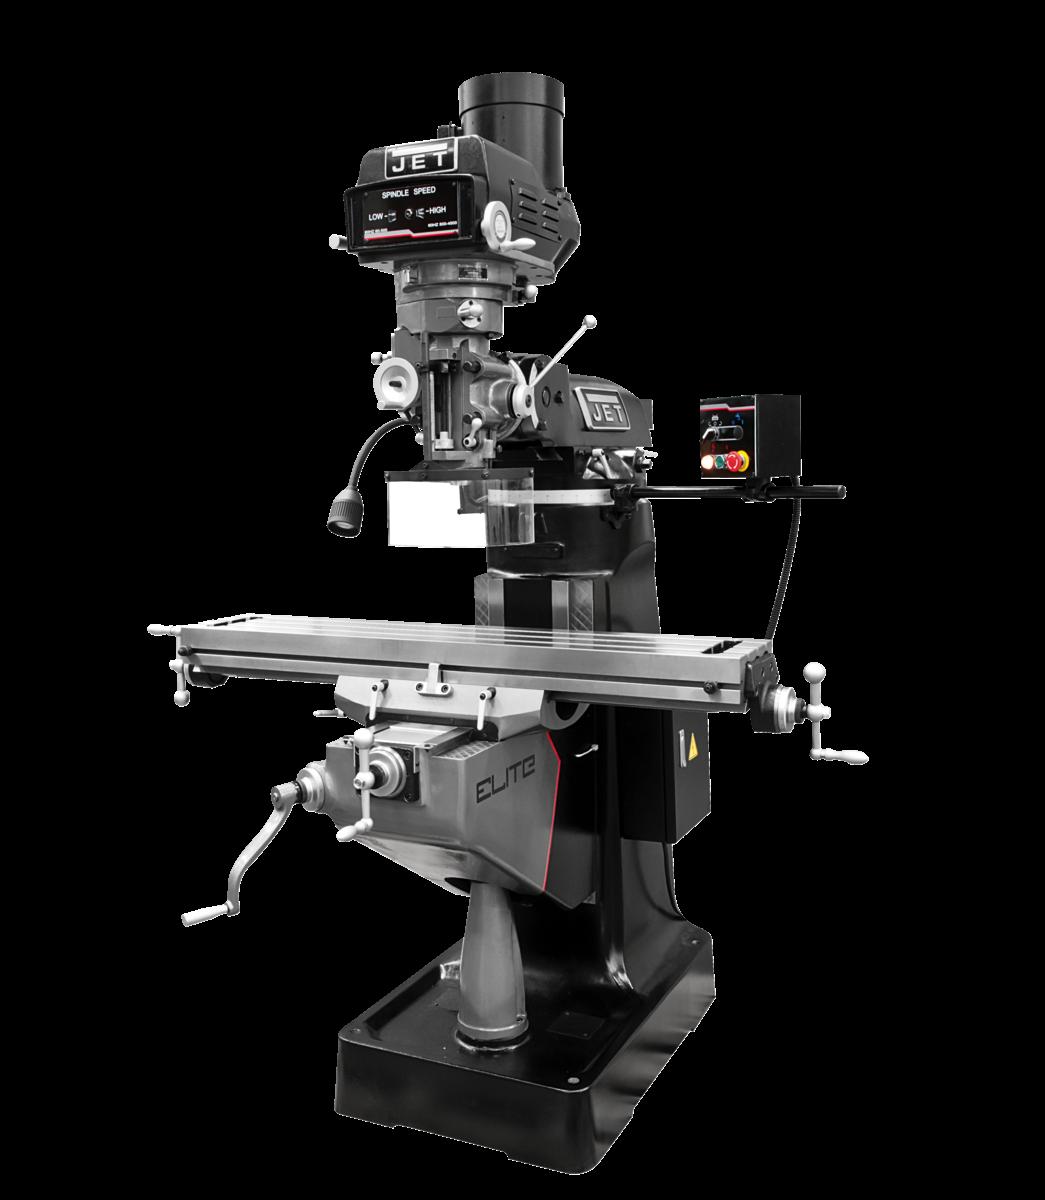 ETM-949 Mill with Servo X, Y-Axis Powerfeeds